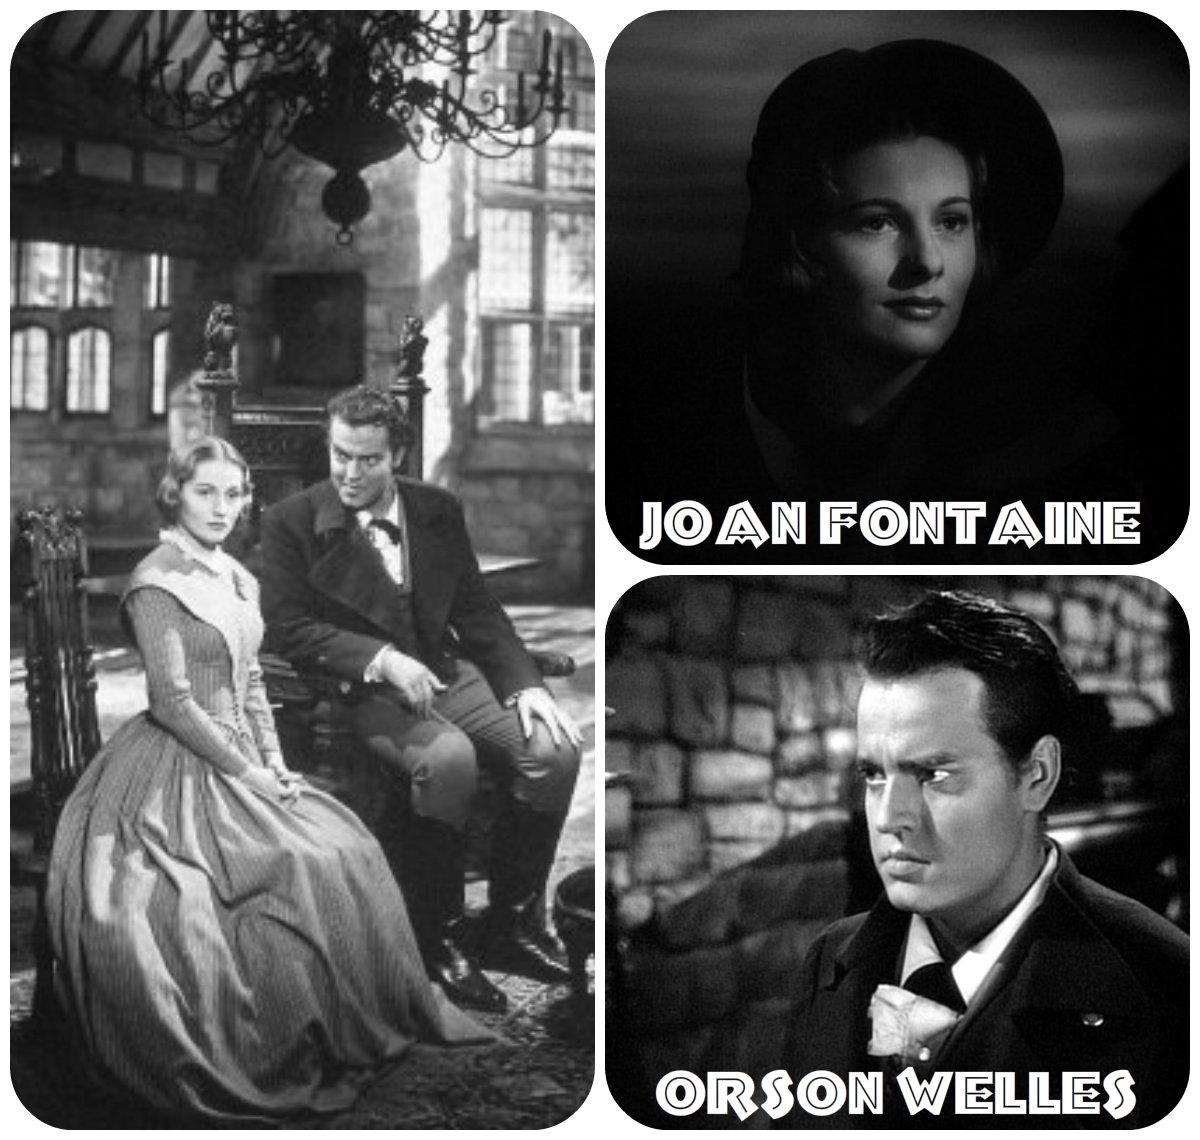 Jane Eyre, Joan Fontaine, Orson Welles, gotico, cine, misterio, pelicula Charlotte Bronte